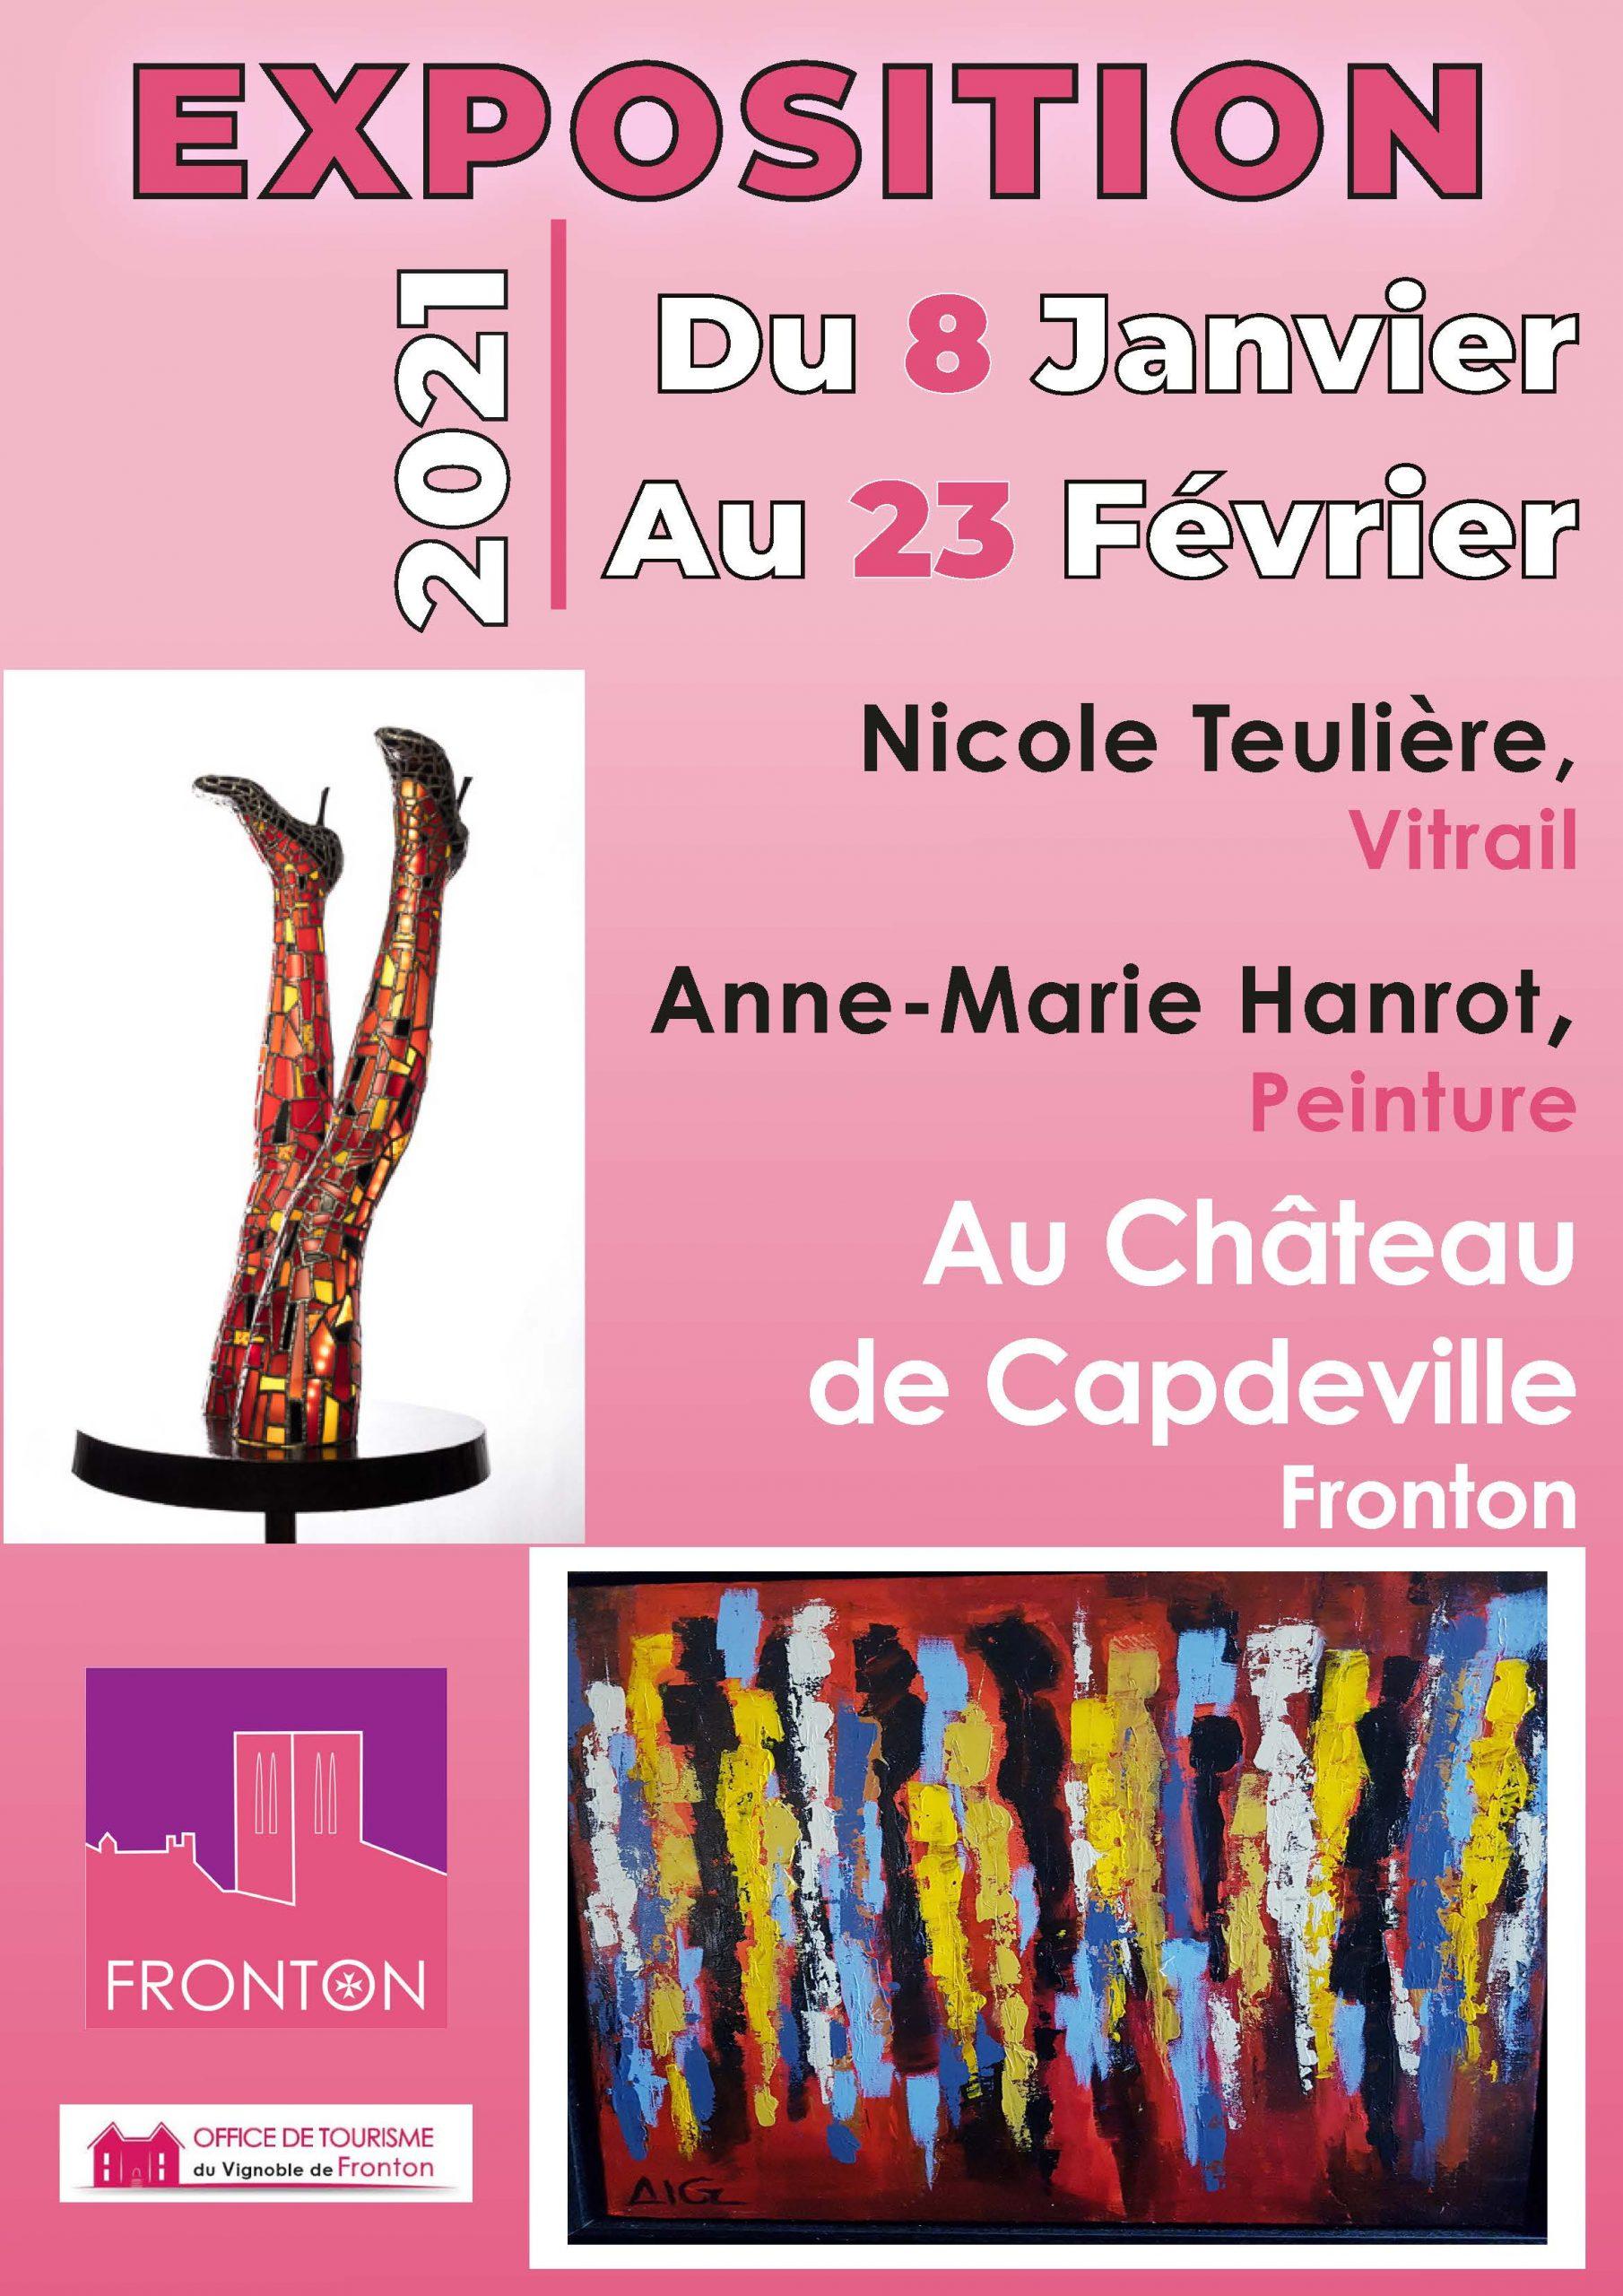 EXPOSITION CHATEAU DE CAPDEVILLE : Nicole TEULIERE & Anne-Marie HANROT